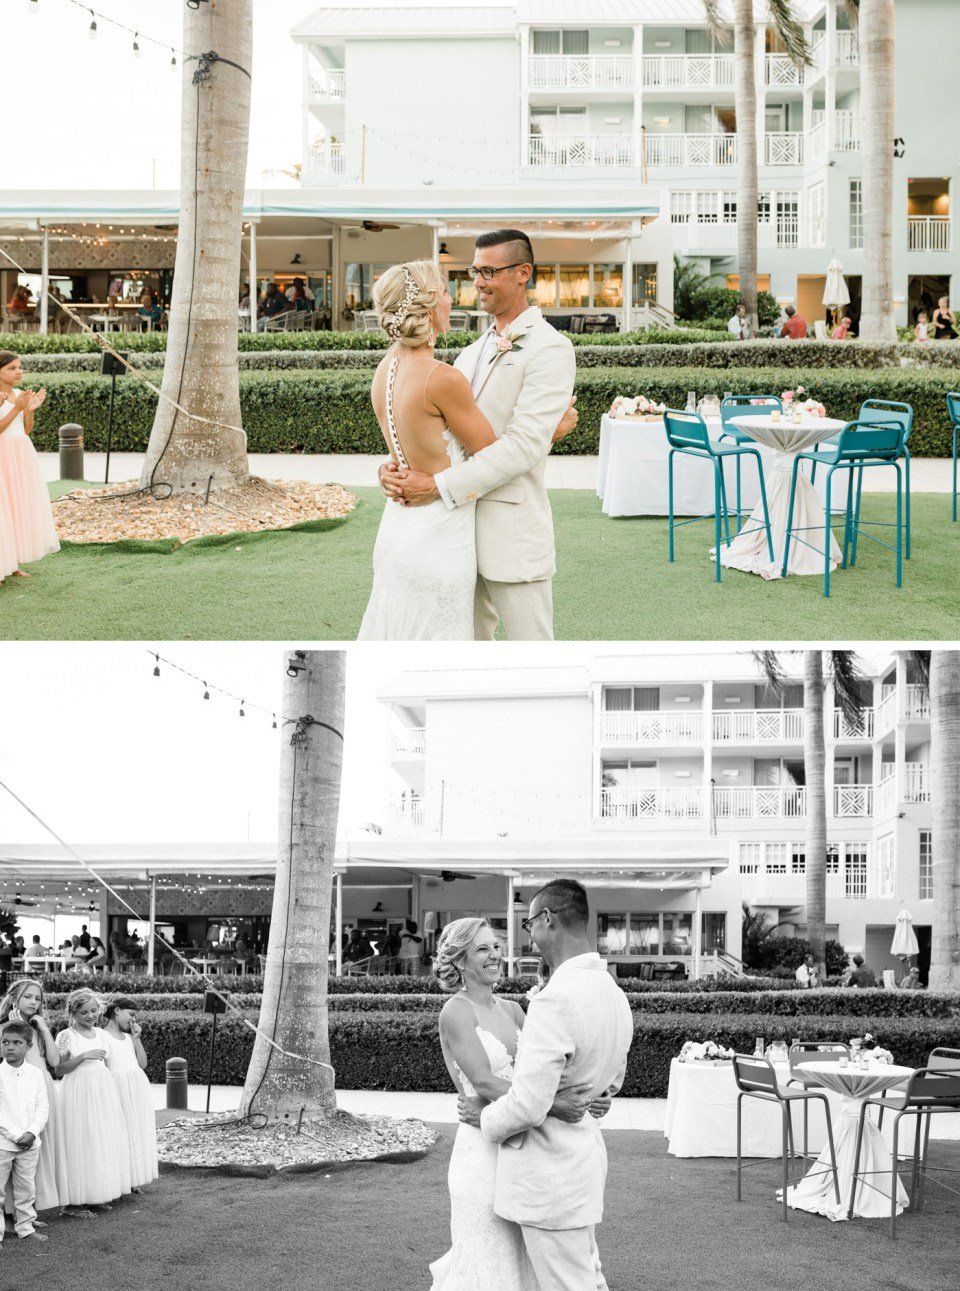 Wedding planning tips for weddings in the Florida Keys